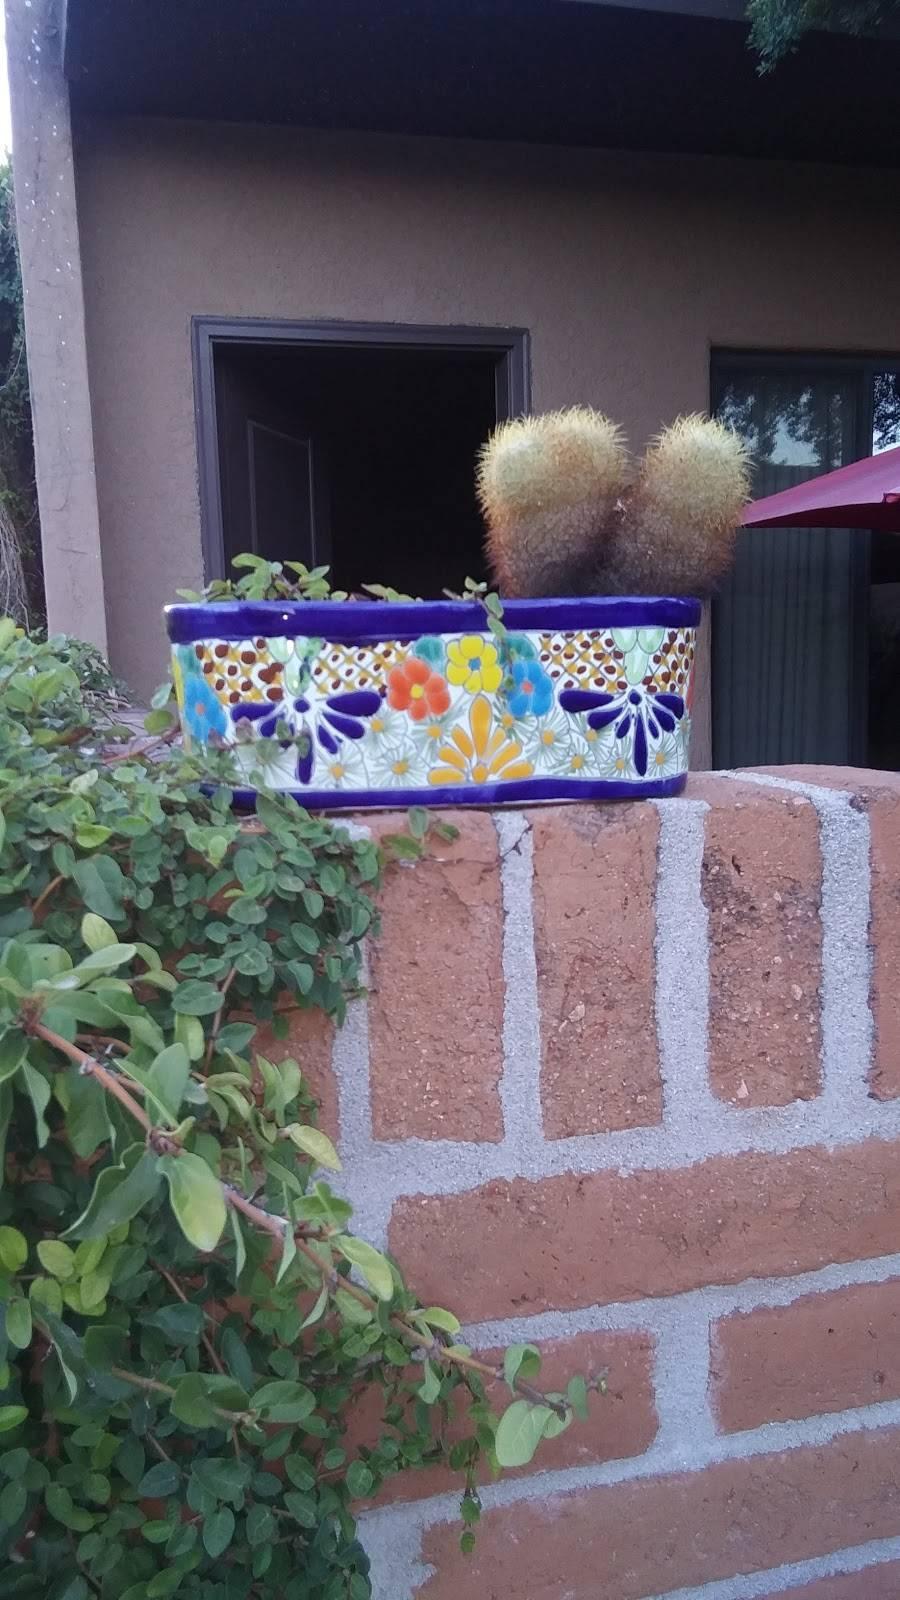 Riverside Suites - real estate agency    Photo 6 of 10   Address: 1725 E Limberlost Dr, Tucson, AZ 85719, USA   Phone: (520) 202-2210